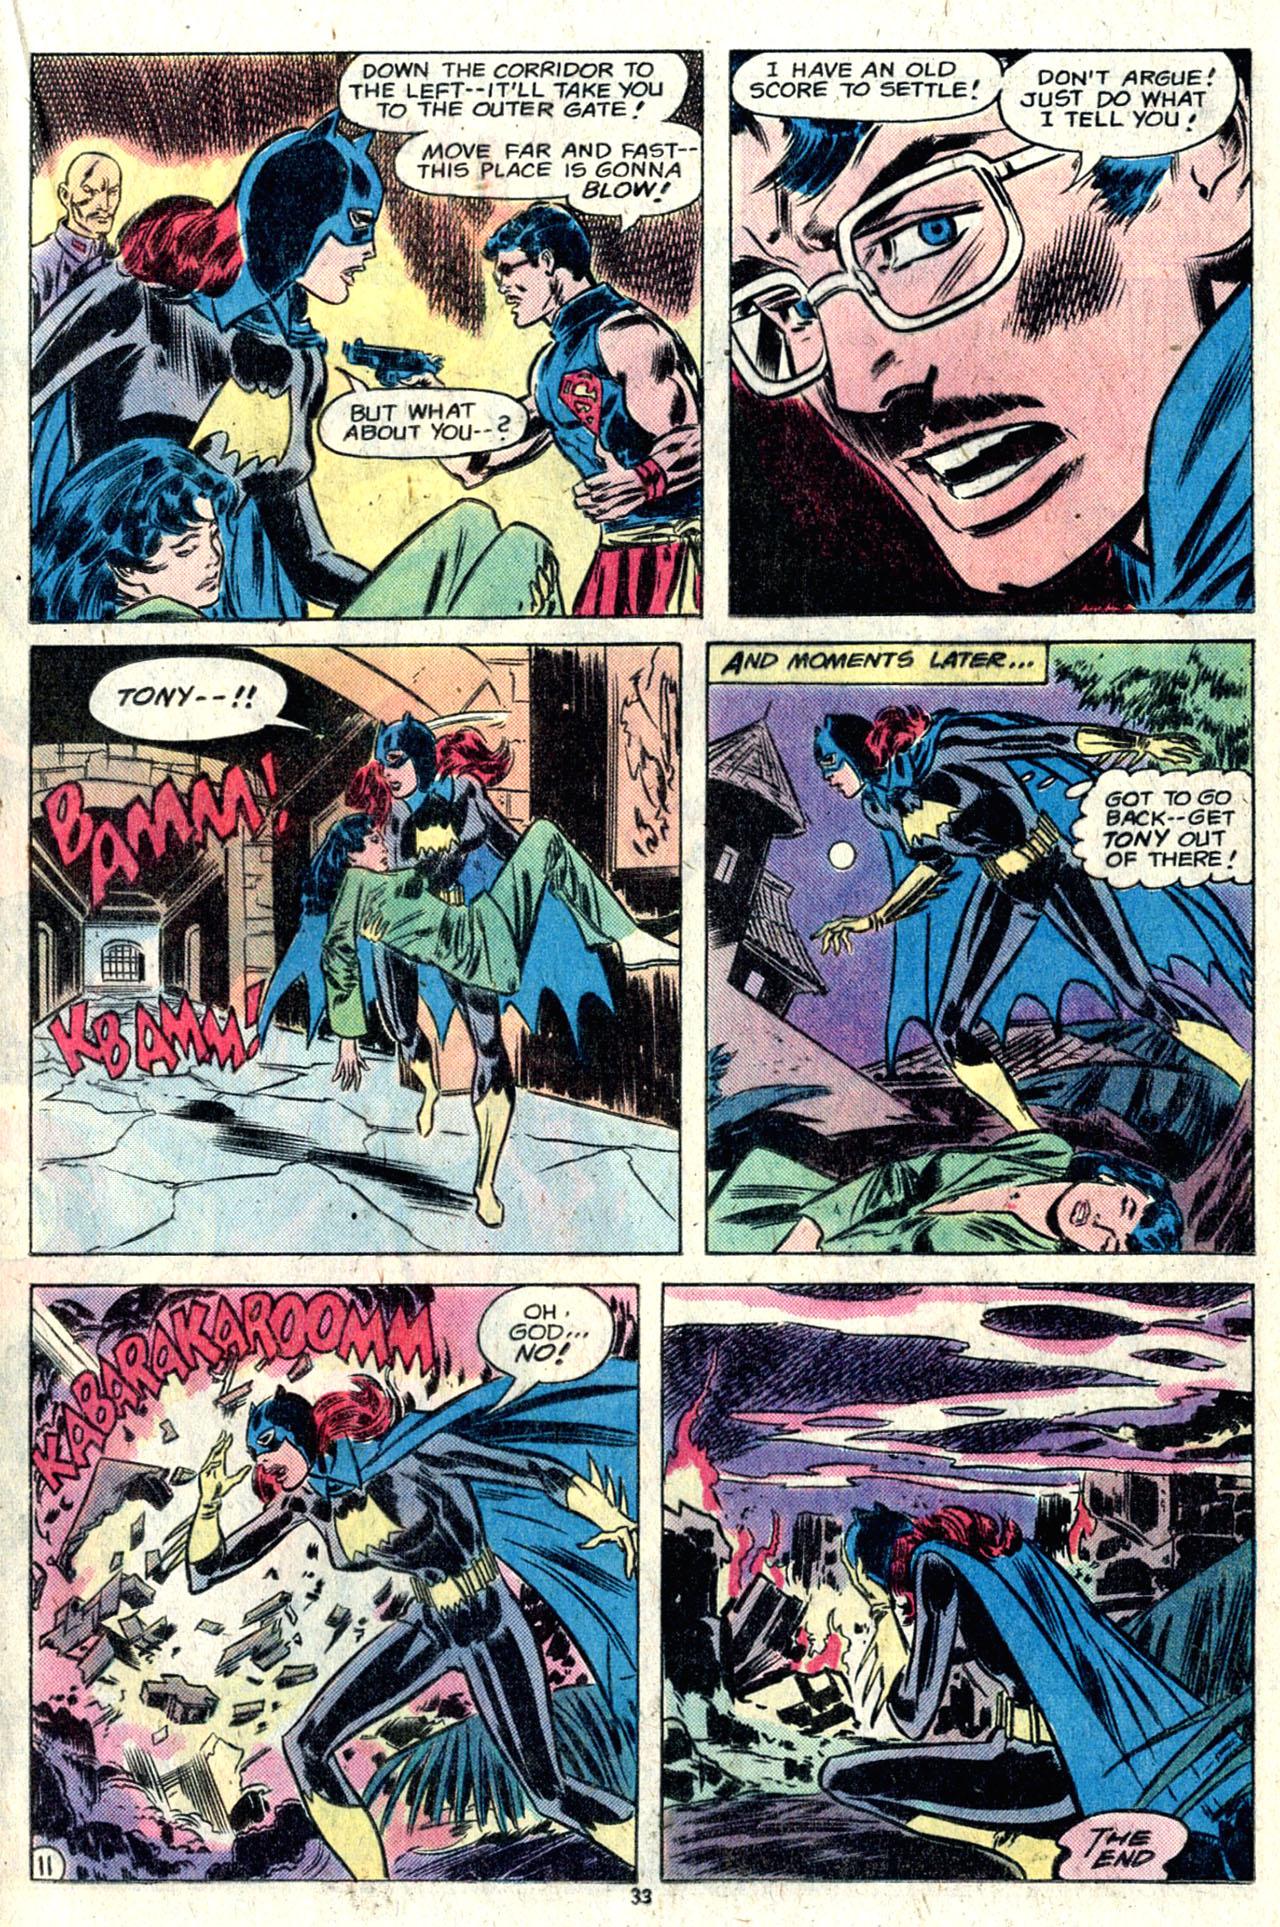 Detective Comics (1937) 482 Page 33